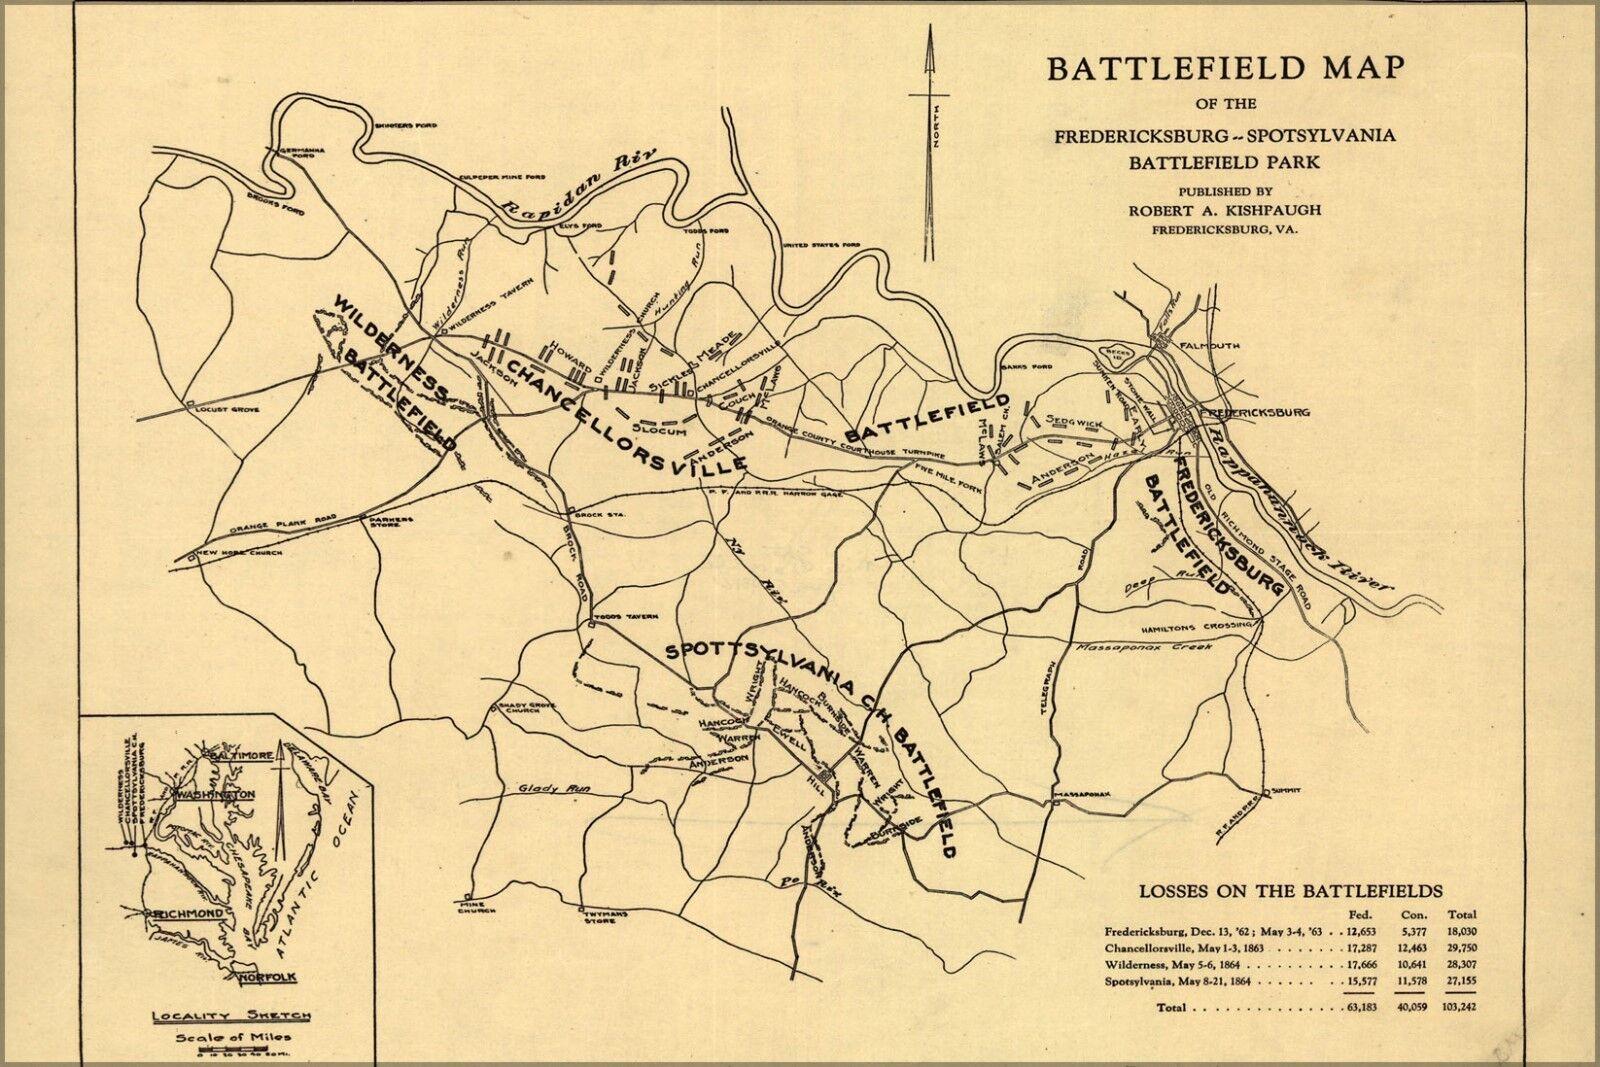 Plakat, Viele Größen; Kampf Field Karte von Frotericksburg Spotsylvania